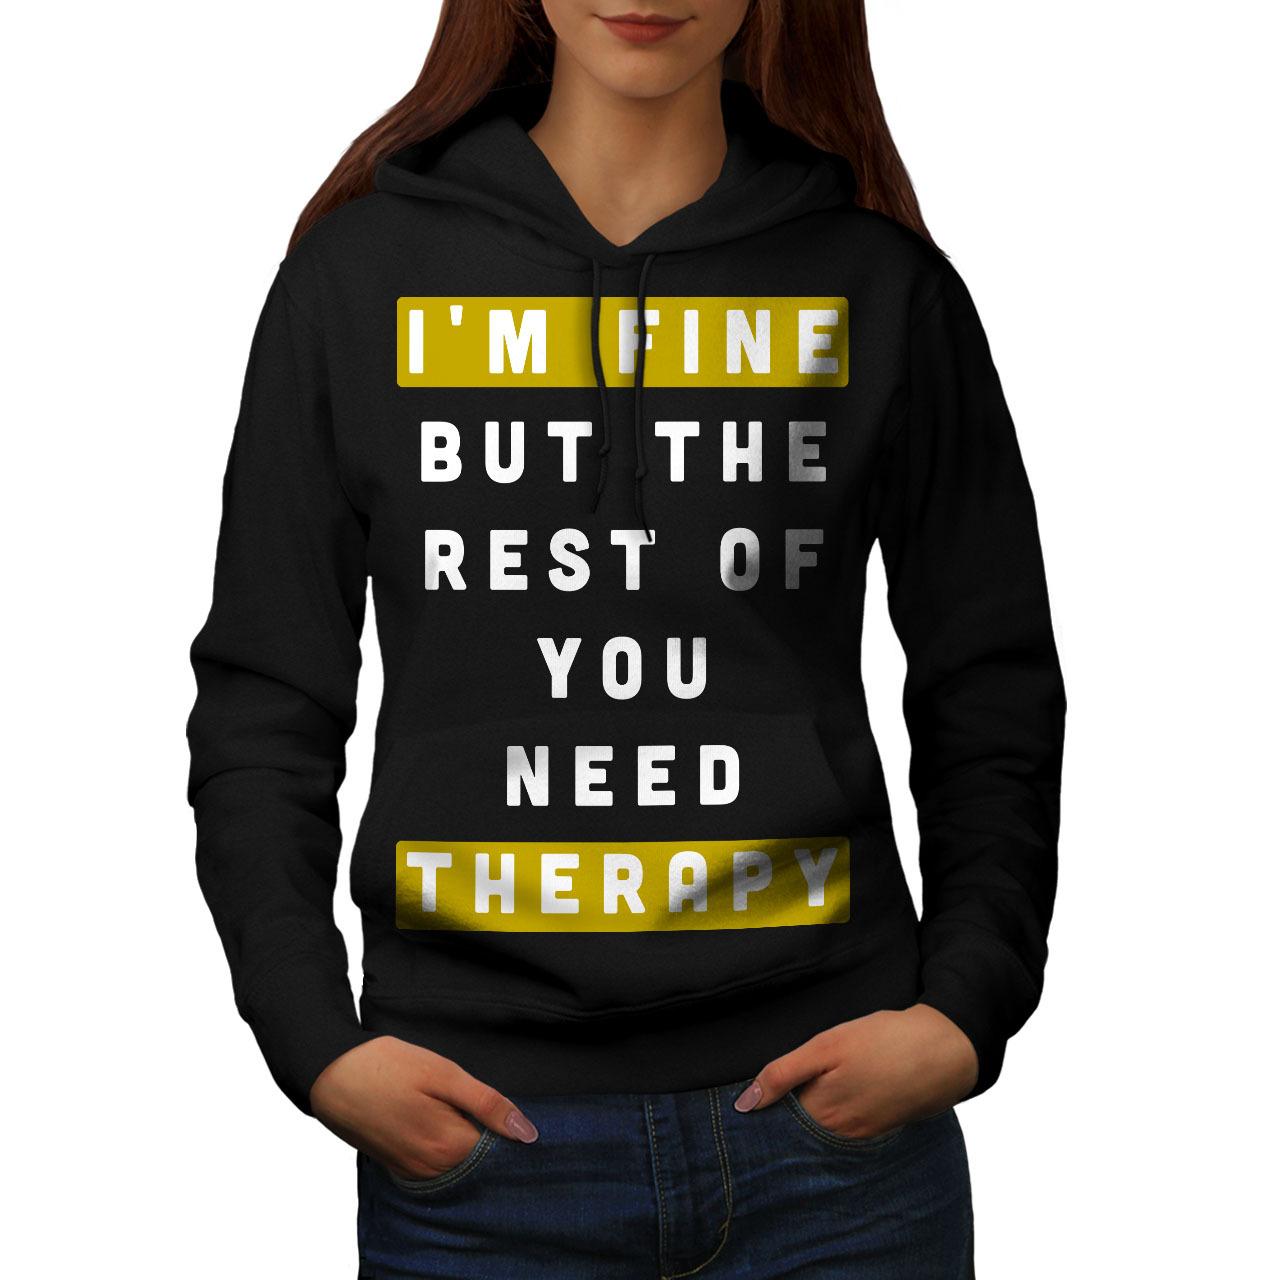 Need Therapy Sweatshirt Hoody Funny Quote Women Hoodie - $21.99 - $22.99